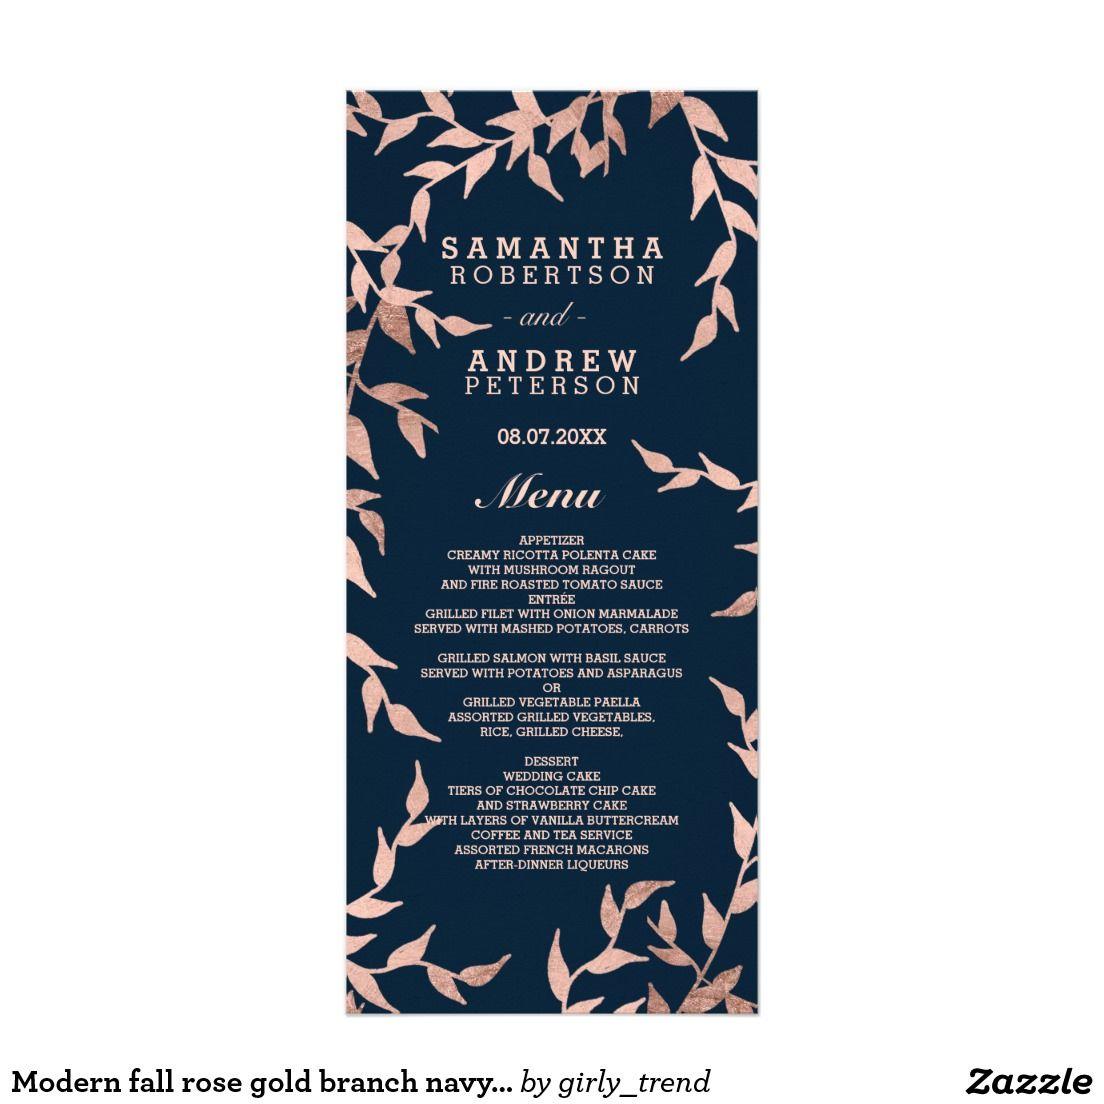 Modern fall rose gold branch navy wedding menu